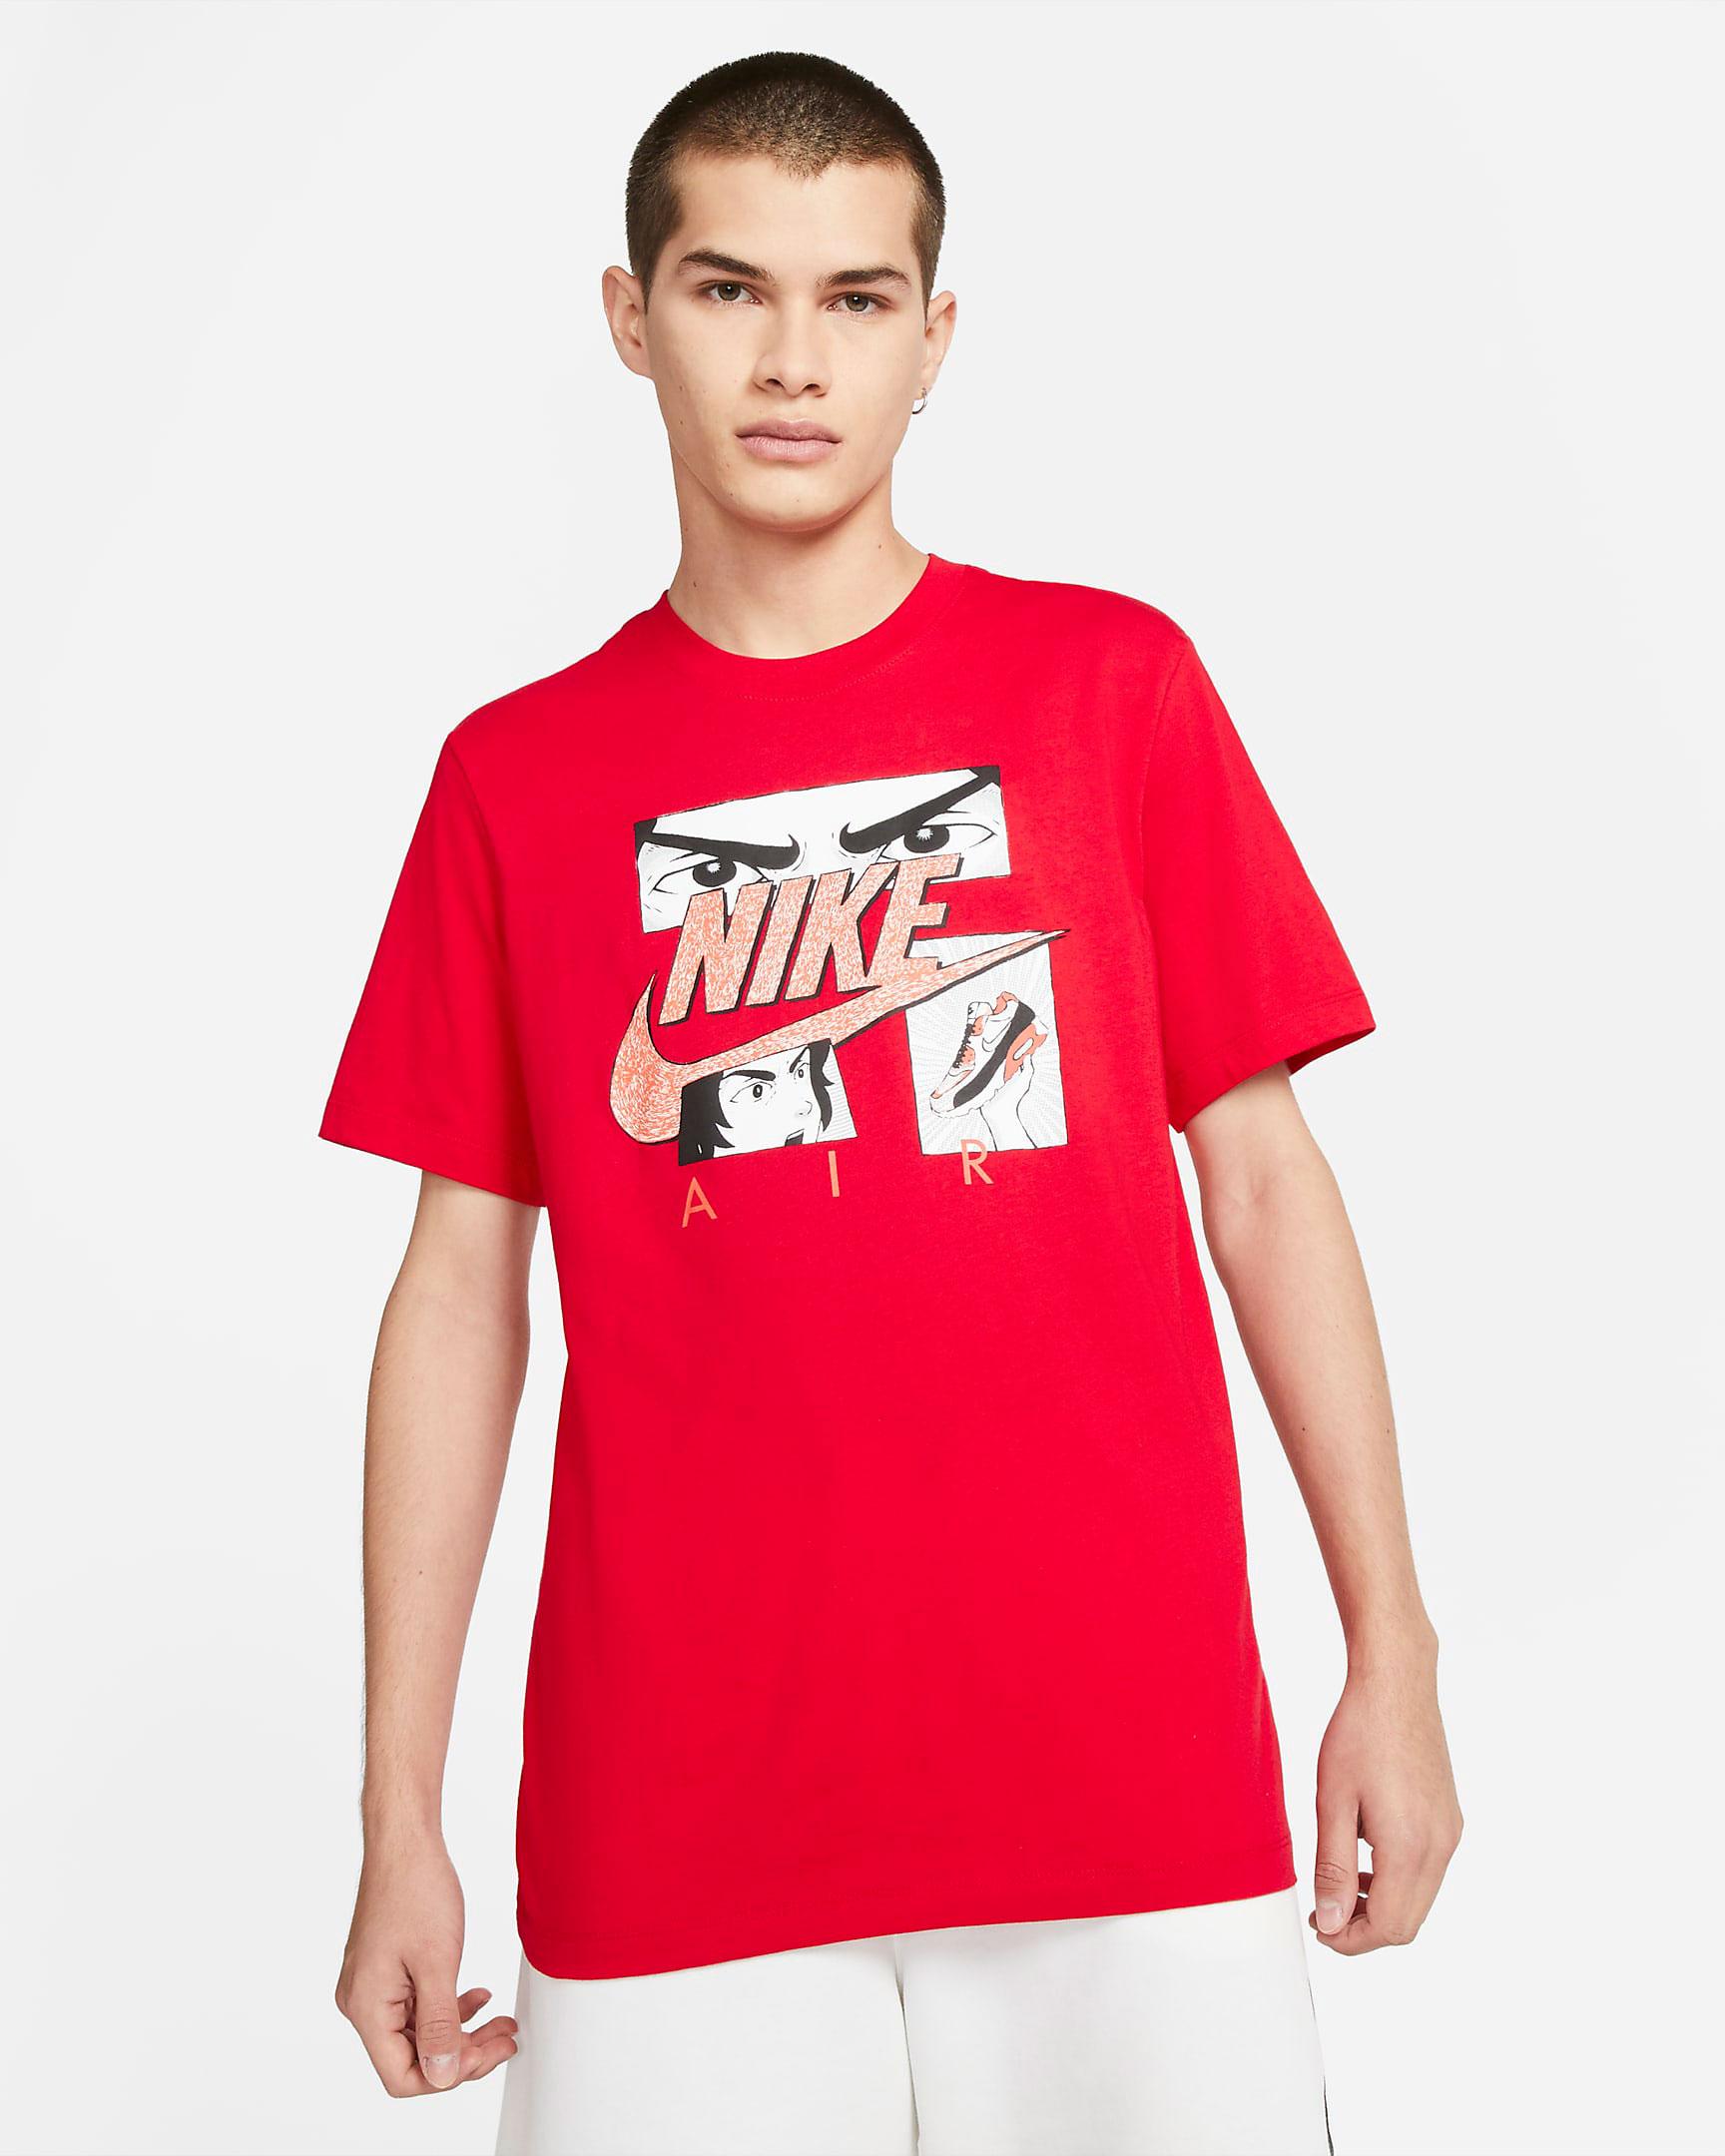 nike-air-max-90-infrared-radiant-red-manga-shirt-red-2